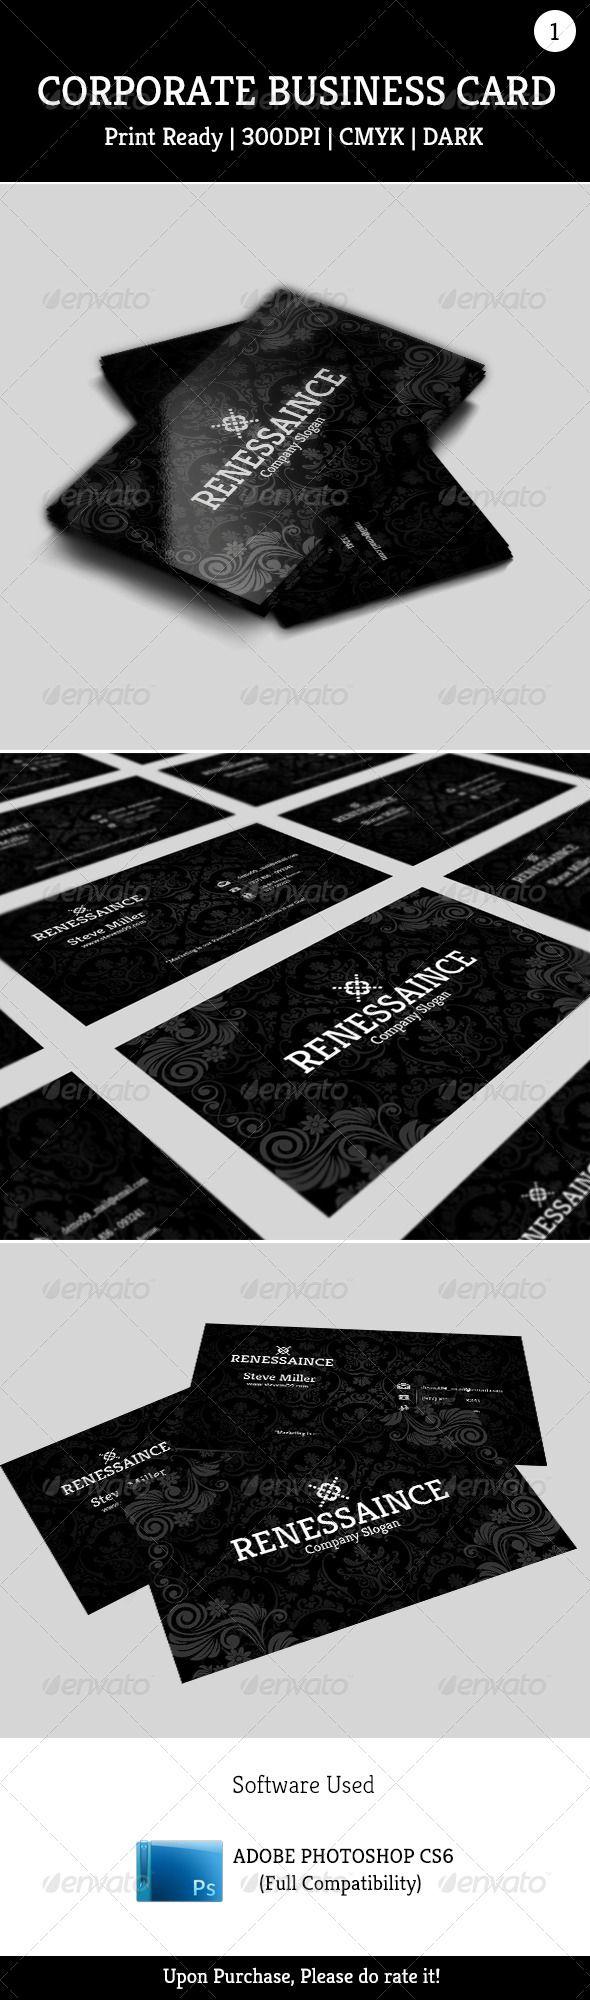 Corporate Business Card 001 - Corporate Business Cards